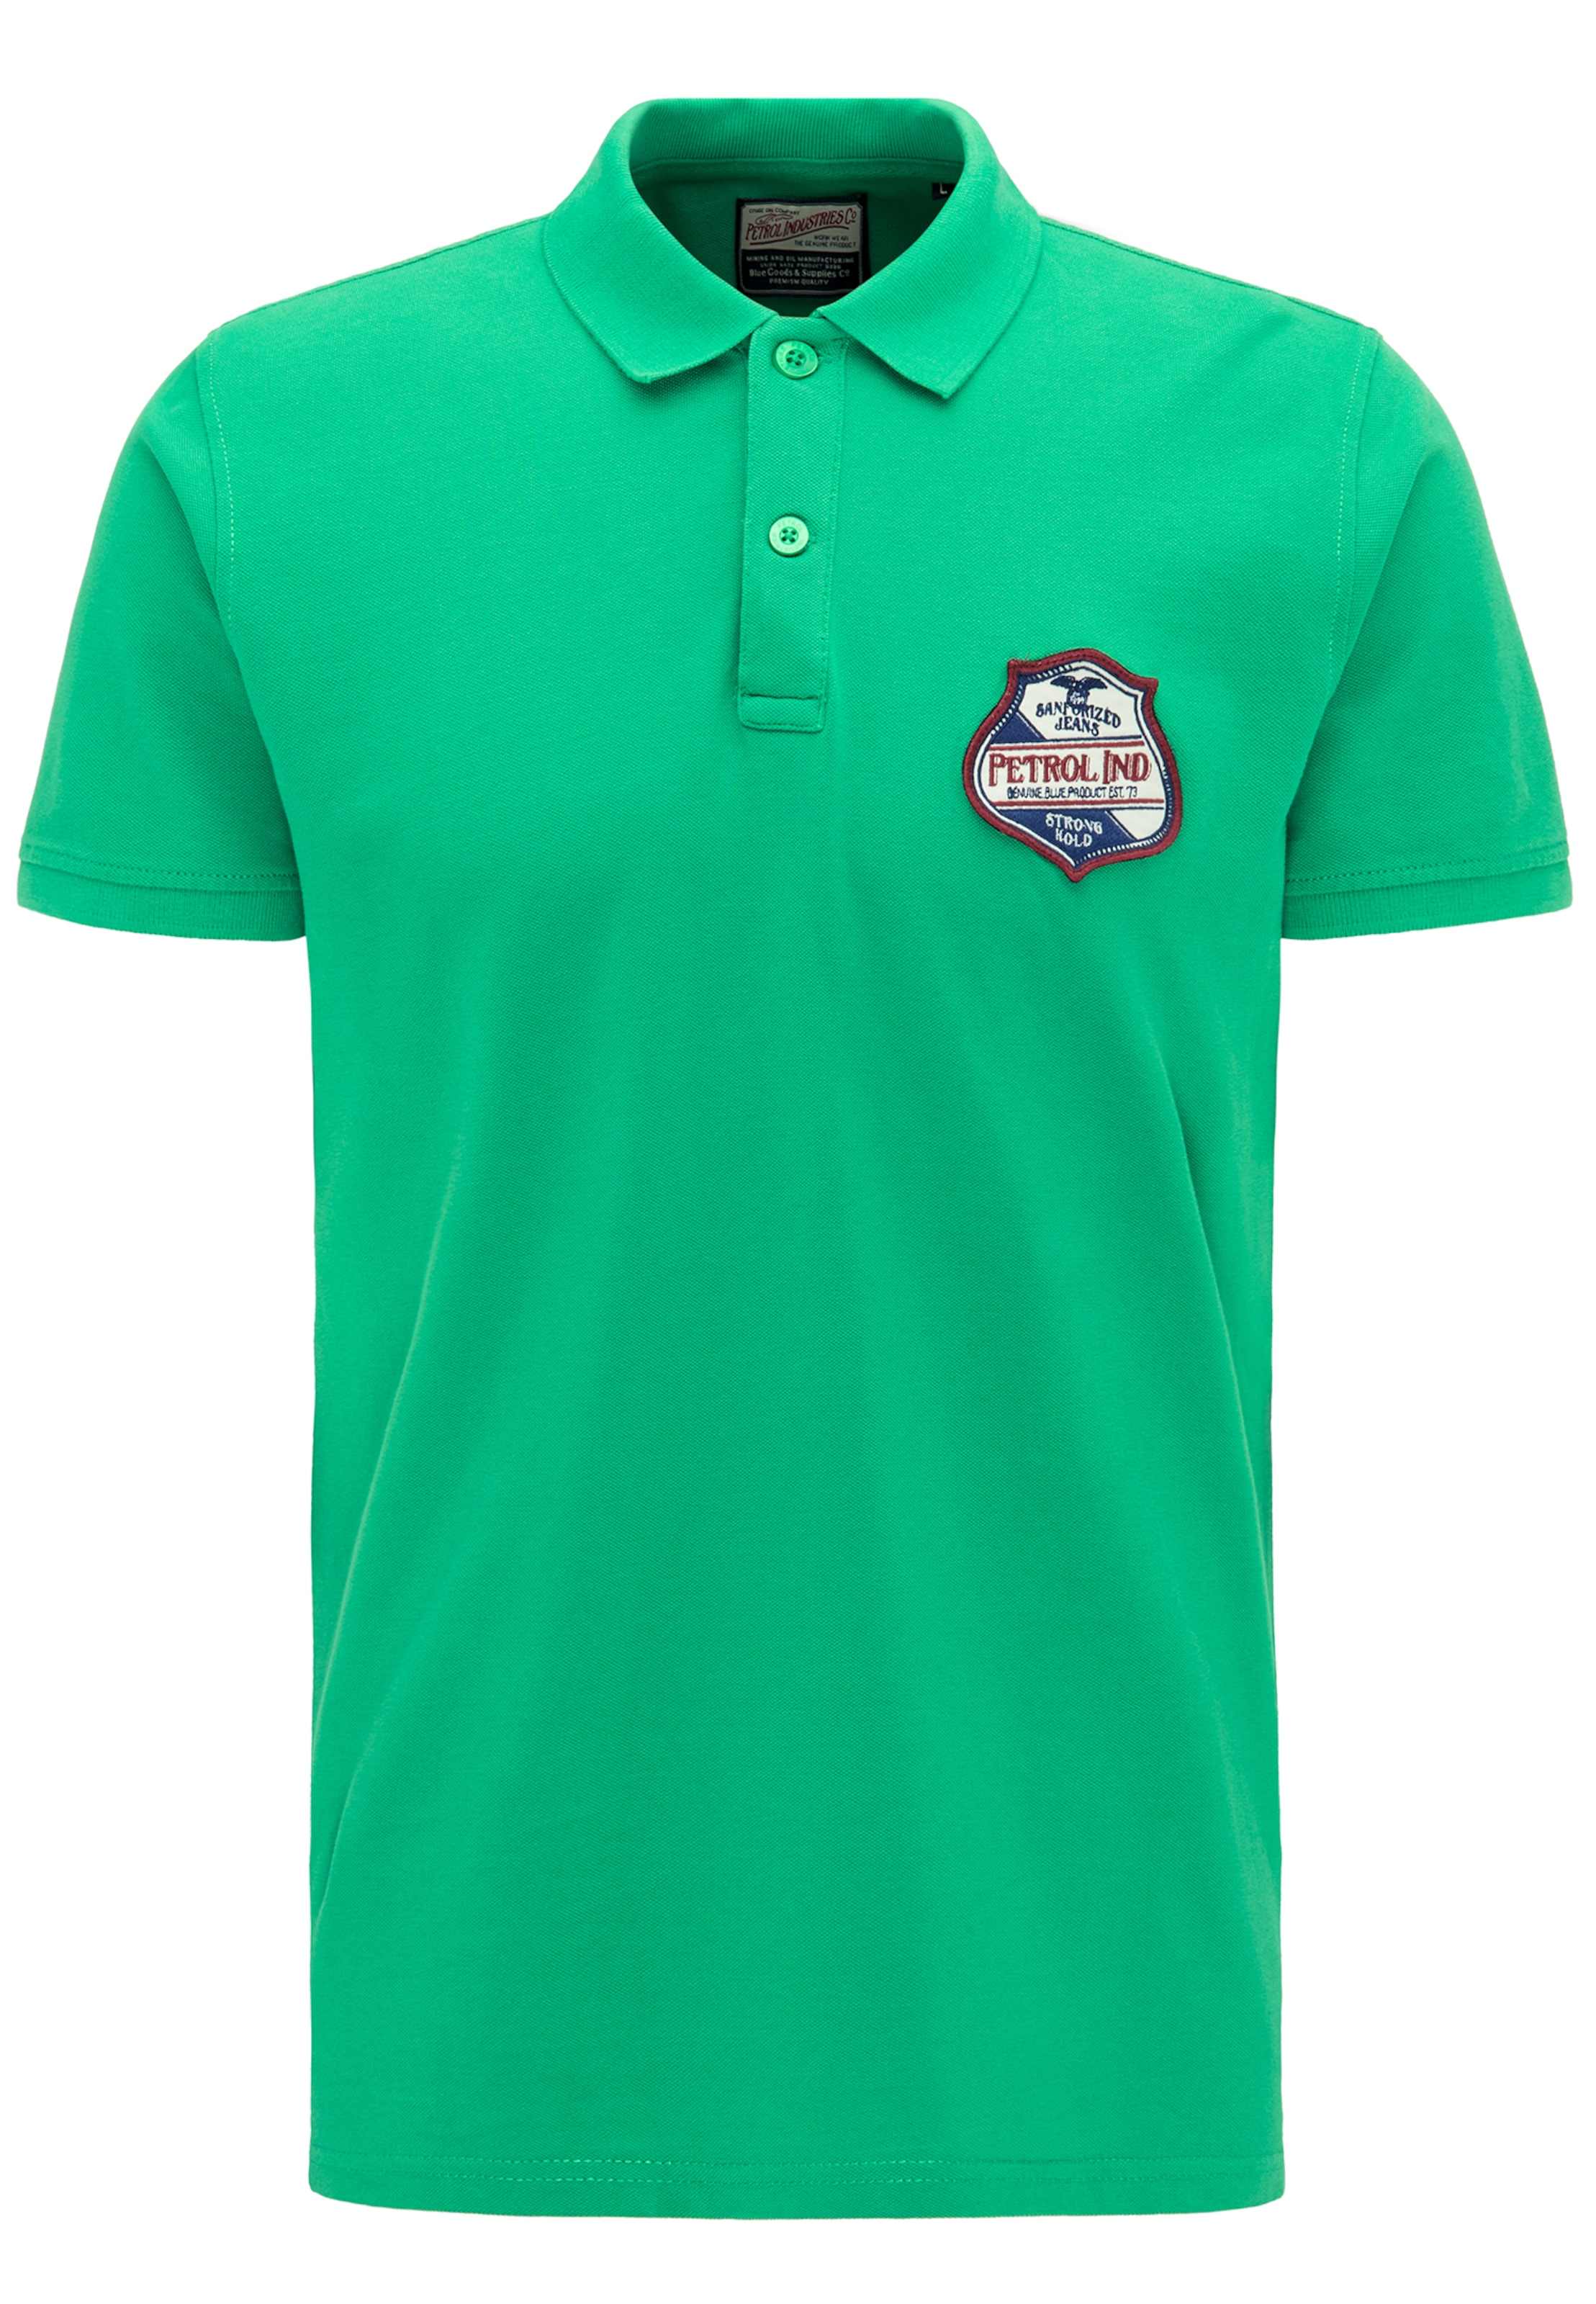 Bleu T Industries shirt En Vert Petrol wfOq4HII